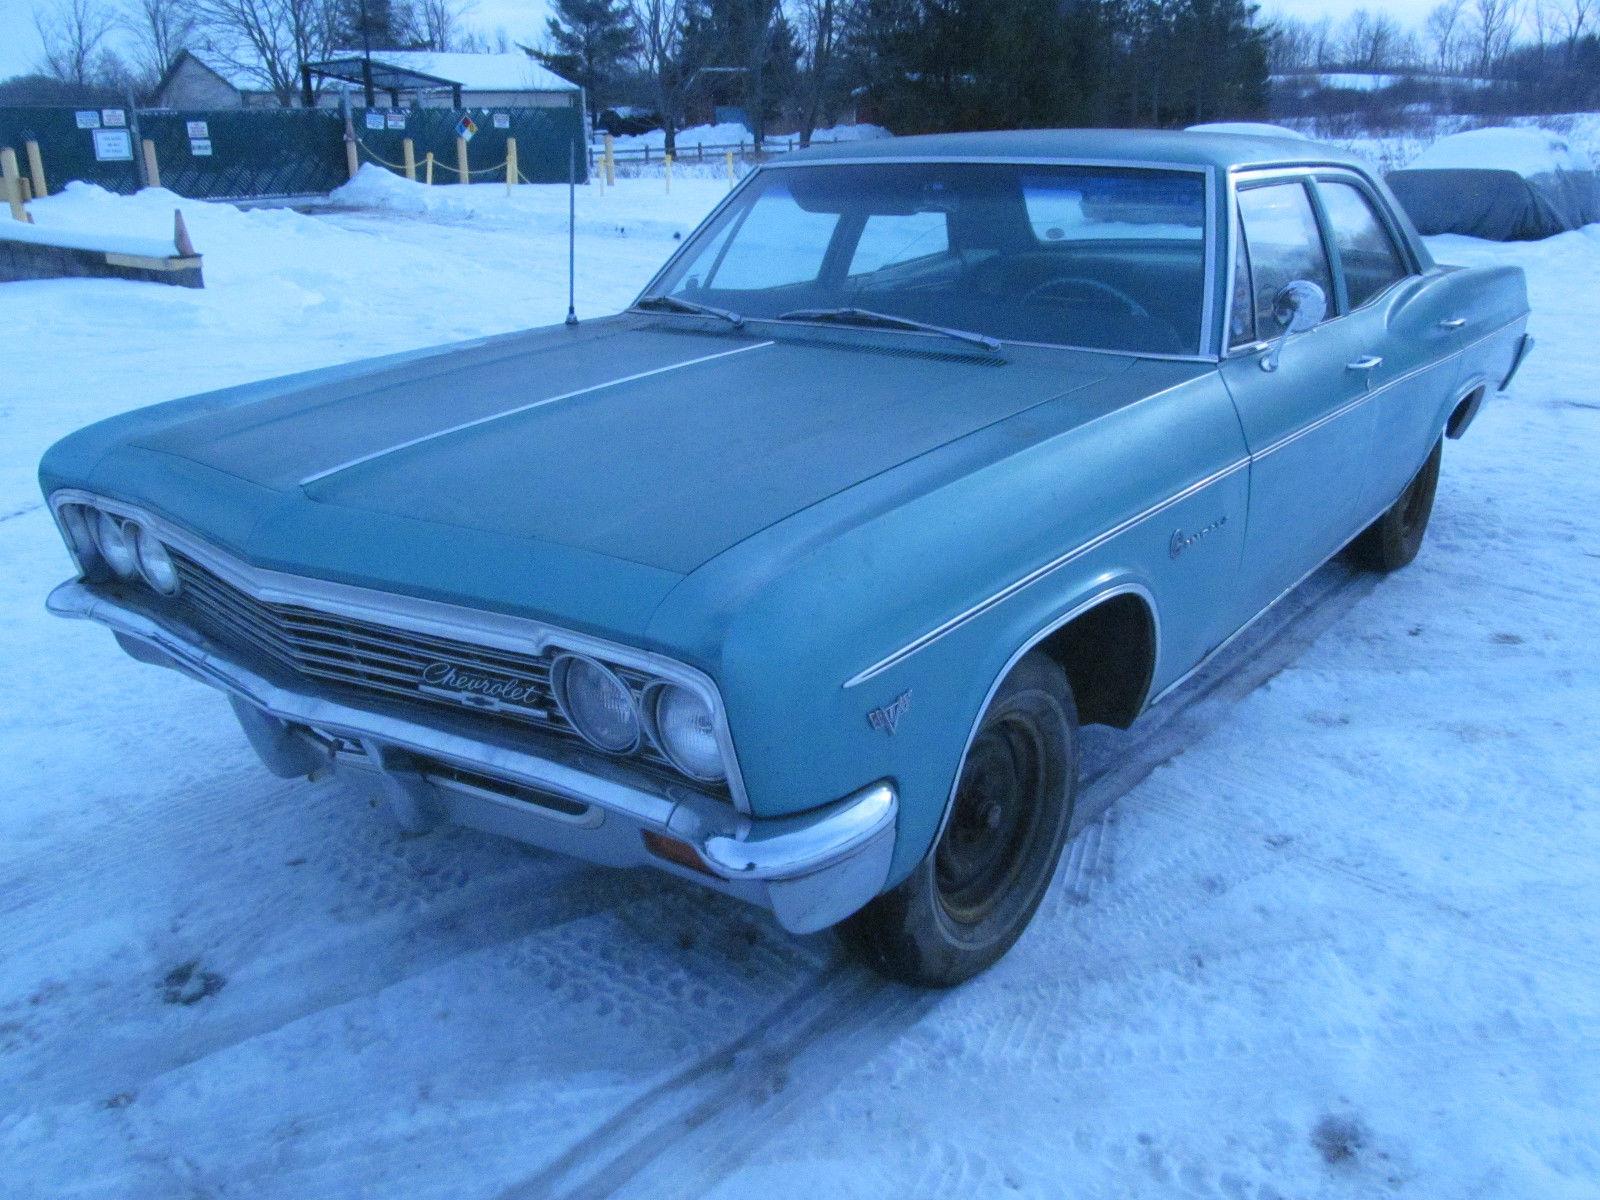 1966 chevy impala 4 door like 1967 possible supernatural metallicar. Black Bedroom Furniture Sets. Home Design Ideas